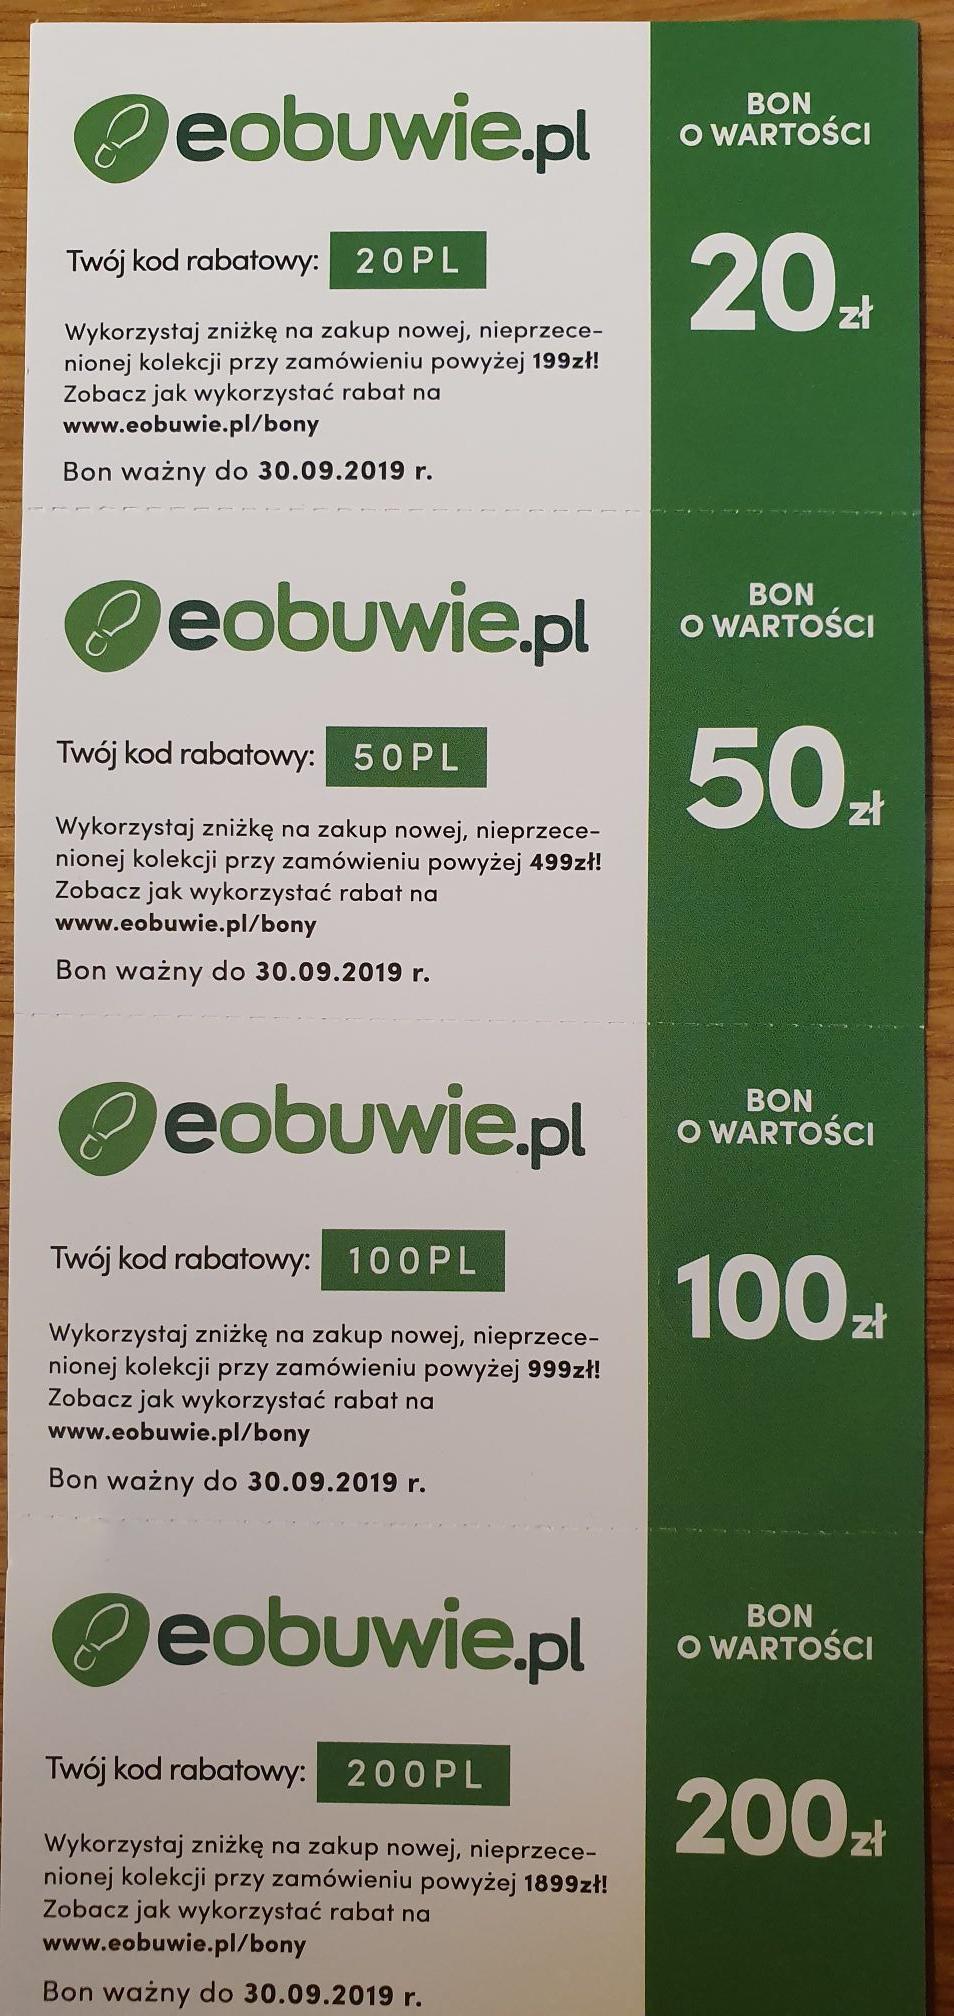 eobuwie.pl rabat 20ZL-200ZL